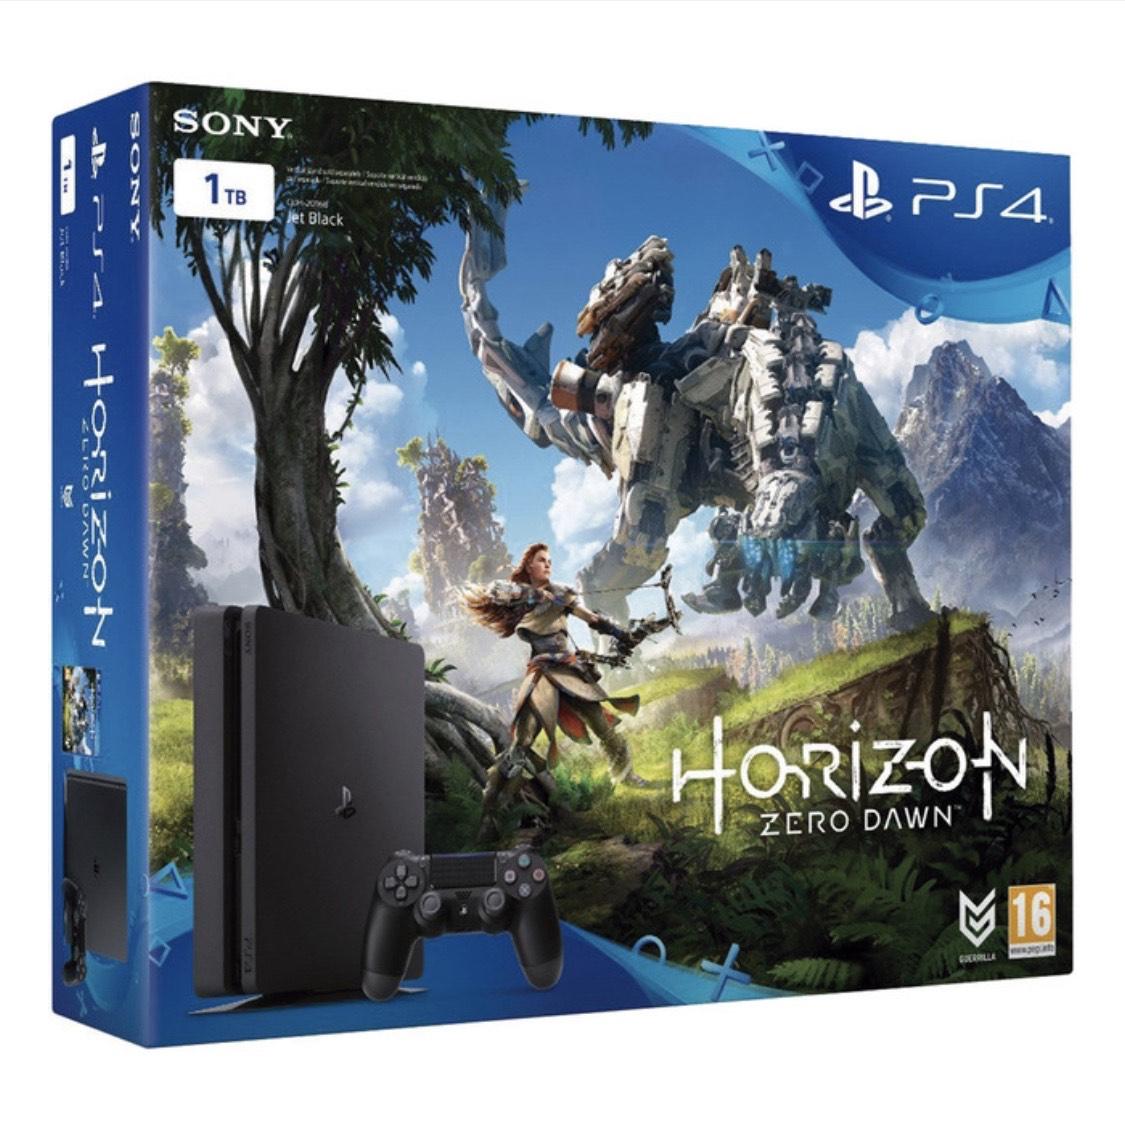 Consola PS4 Slim (Chasis D) de 1 TB + Horizon Zero Dawn